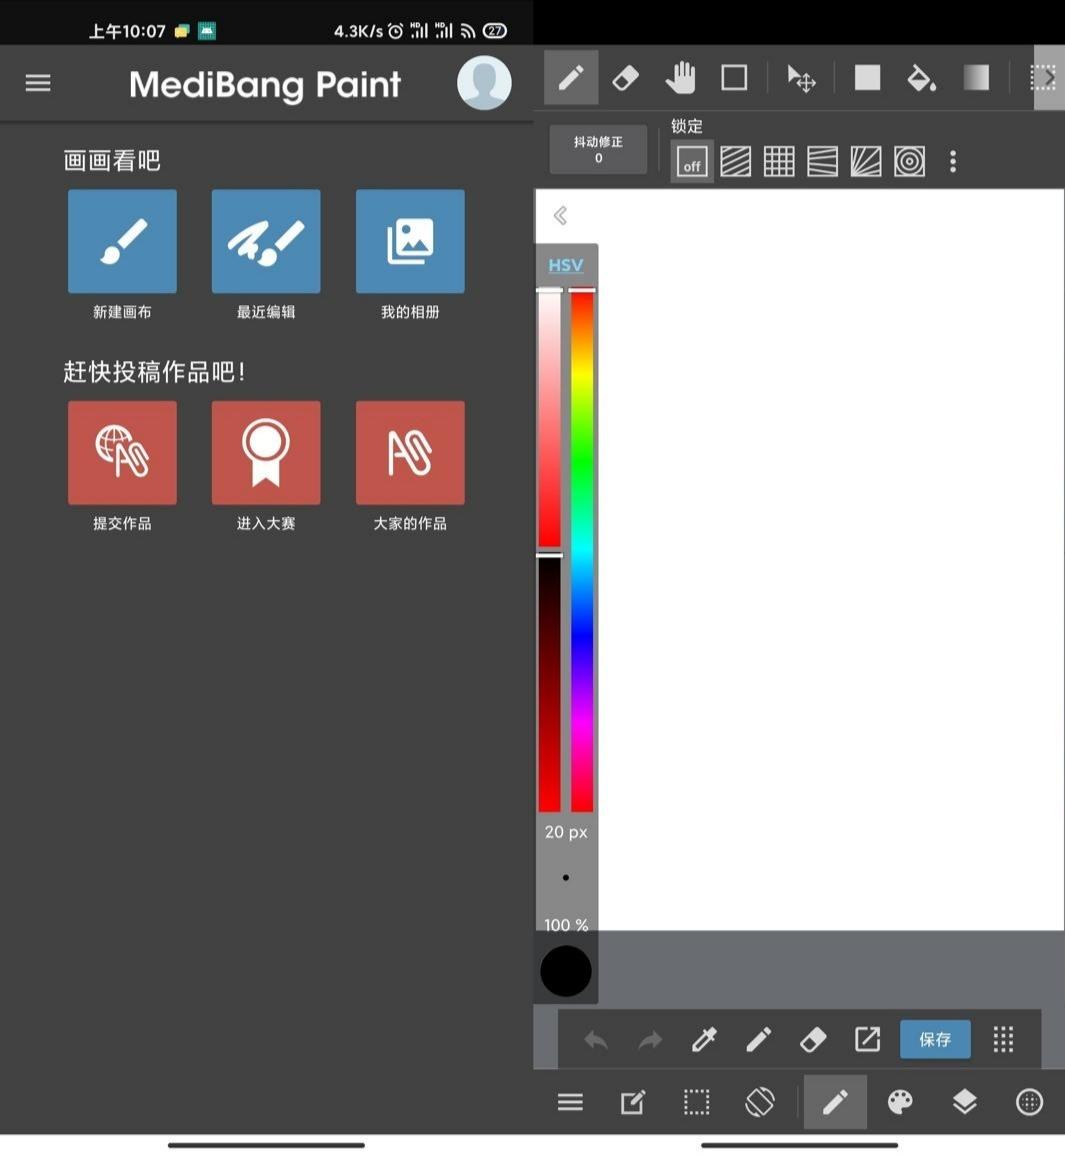 MediBang Paint v19.2